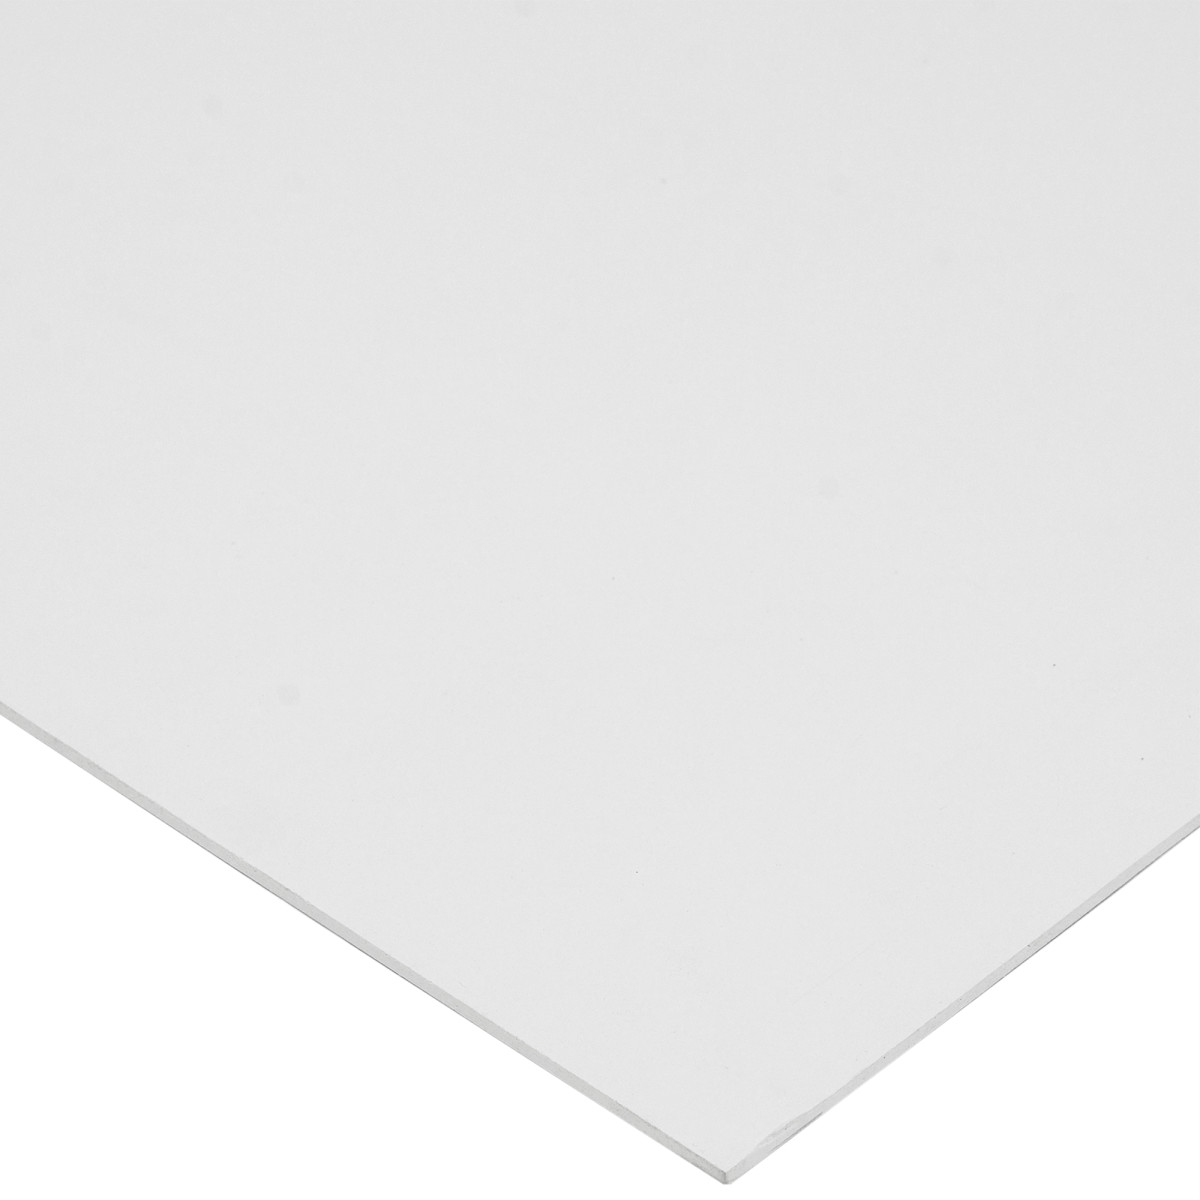 Вспененный ПВХ 3 мм 1500x500 мм белый 0.75 м²